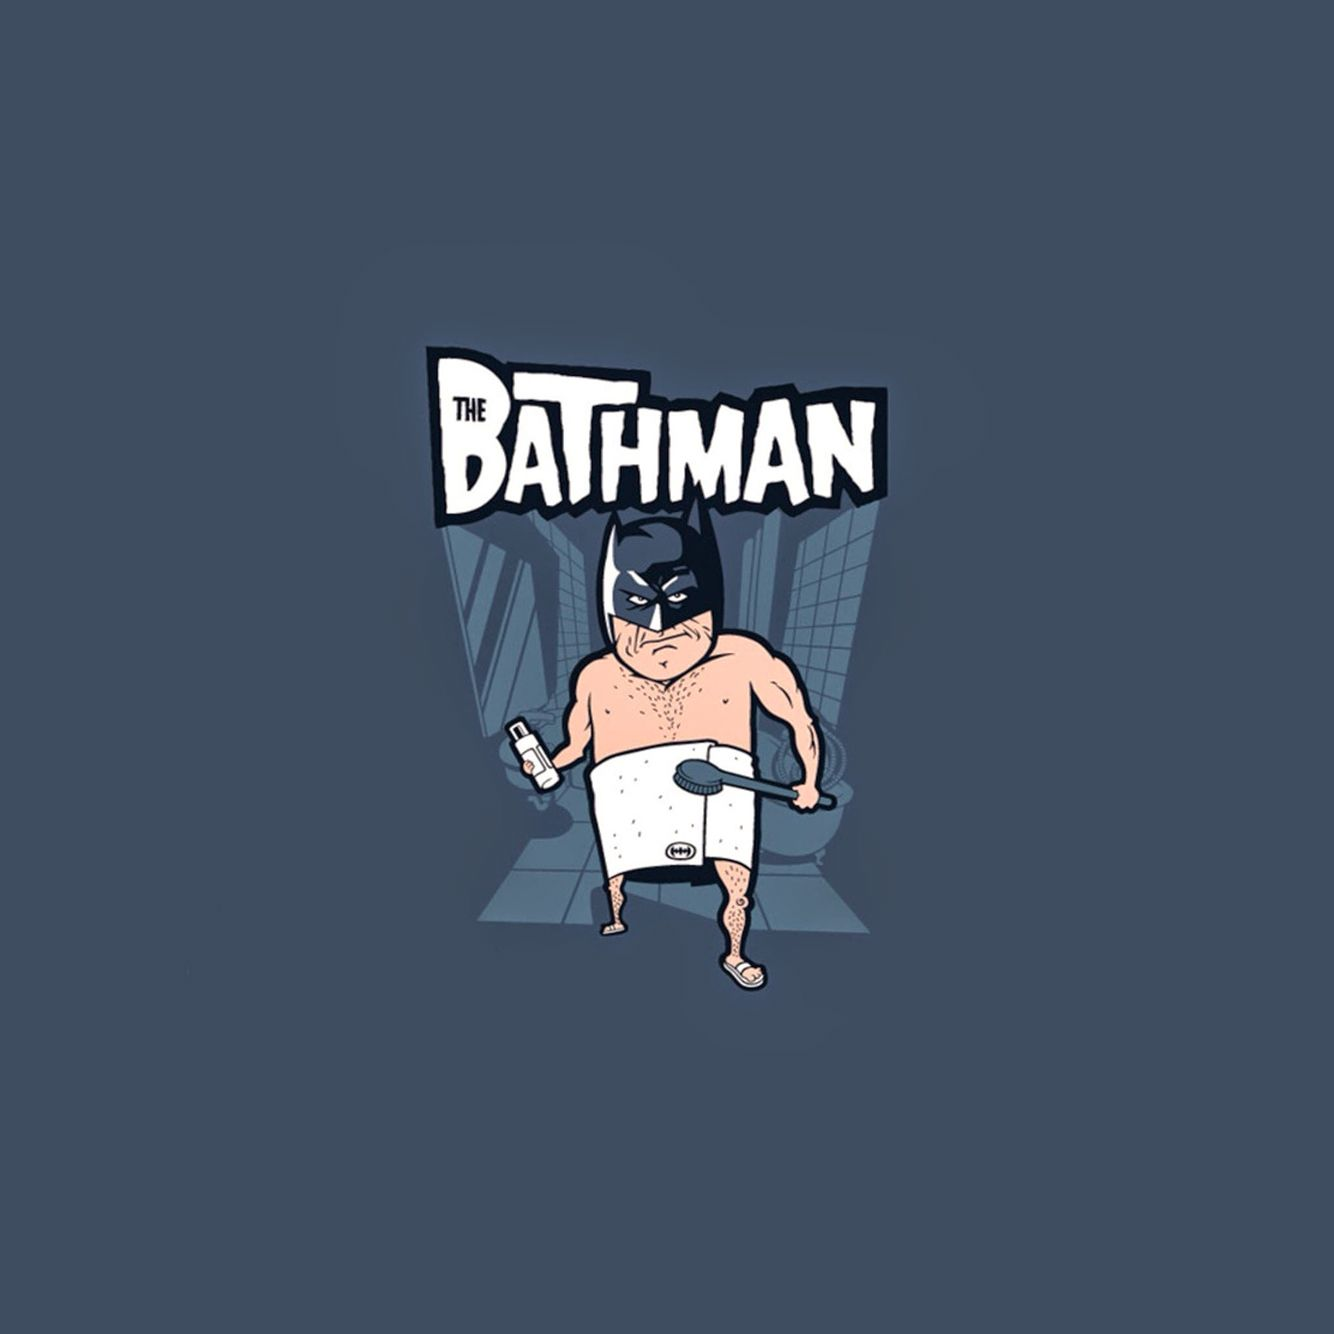 Funny Iphone Wallpapers: Bathman! LOL! Batman!😂 HD Wallpapers!